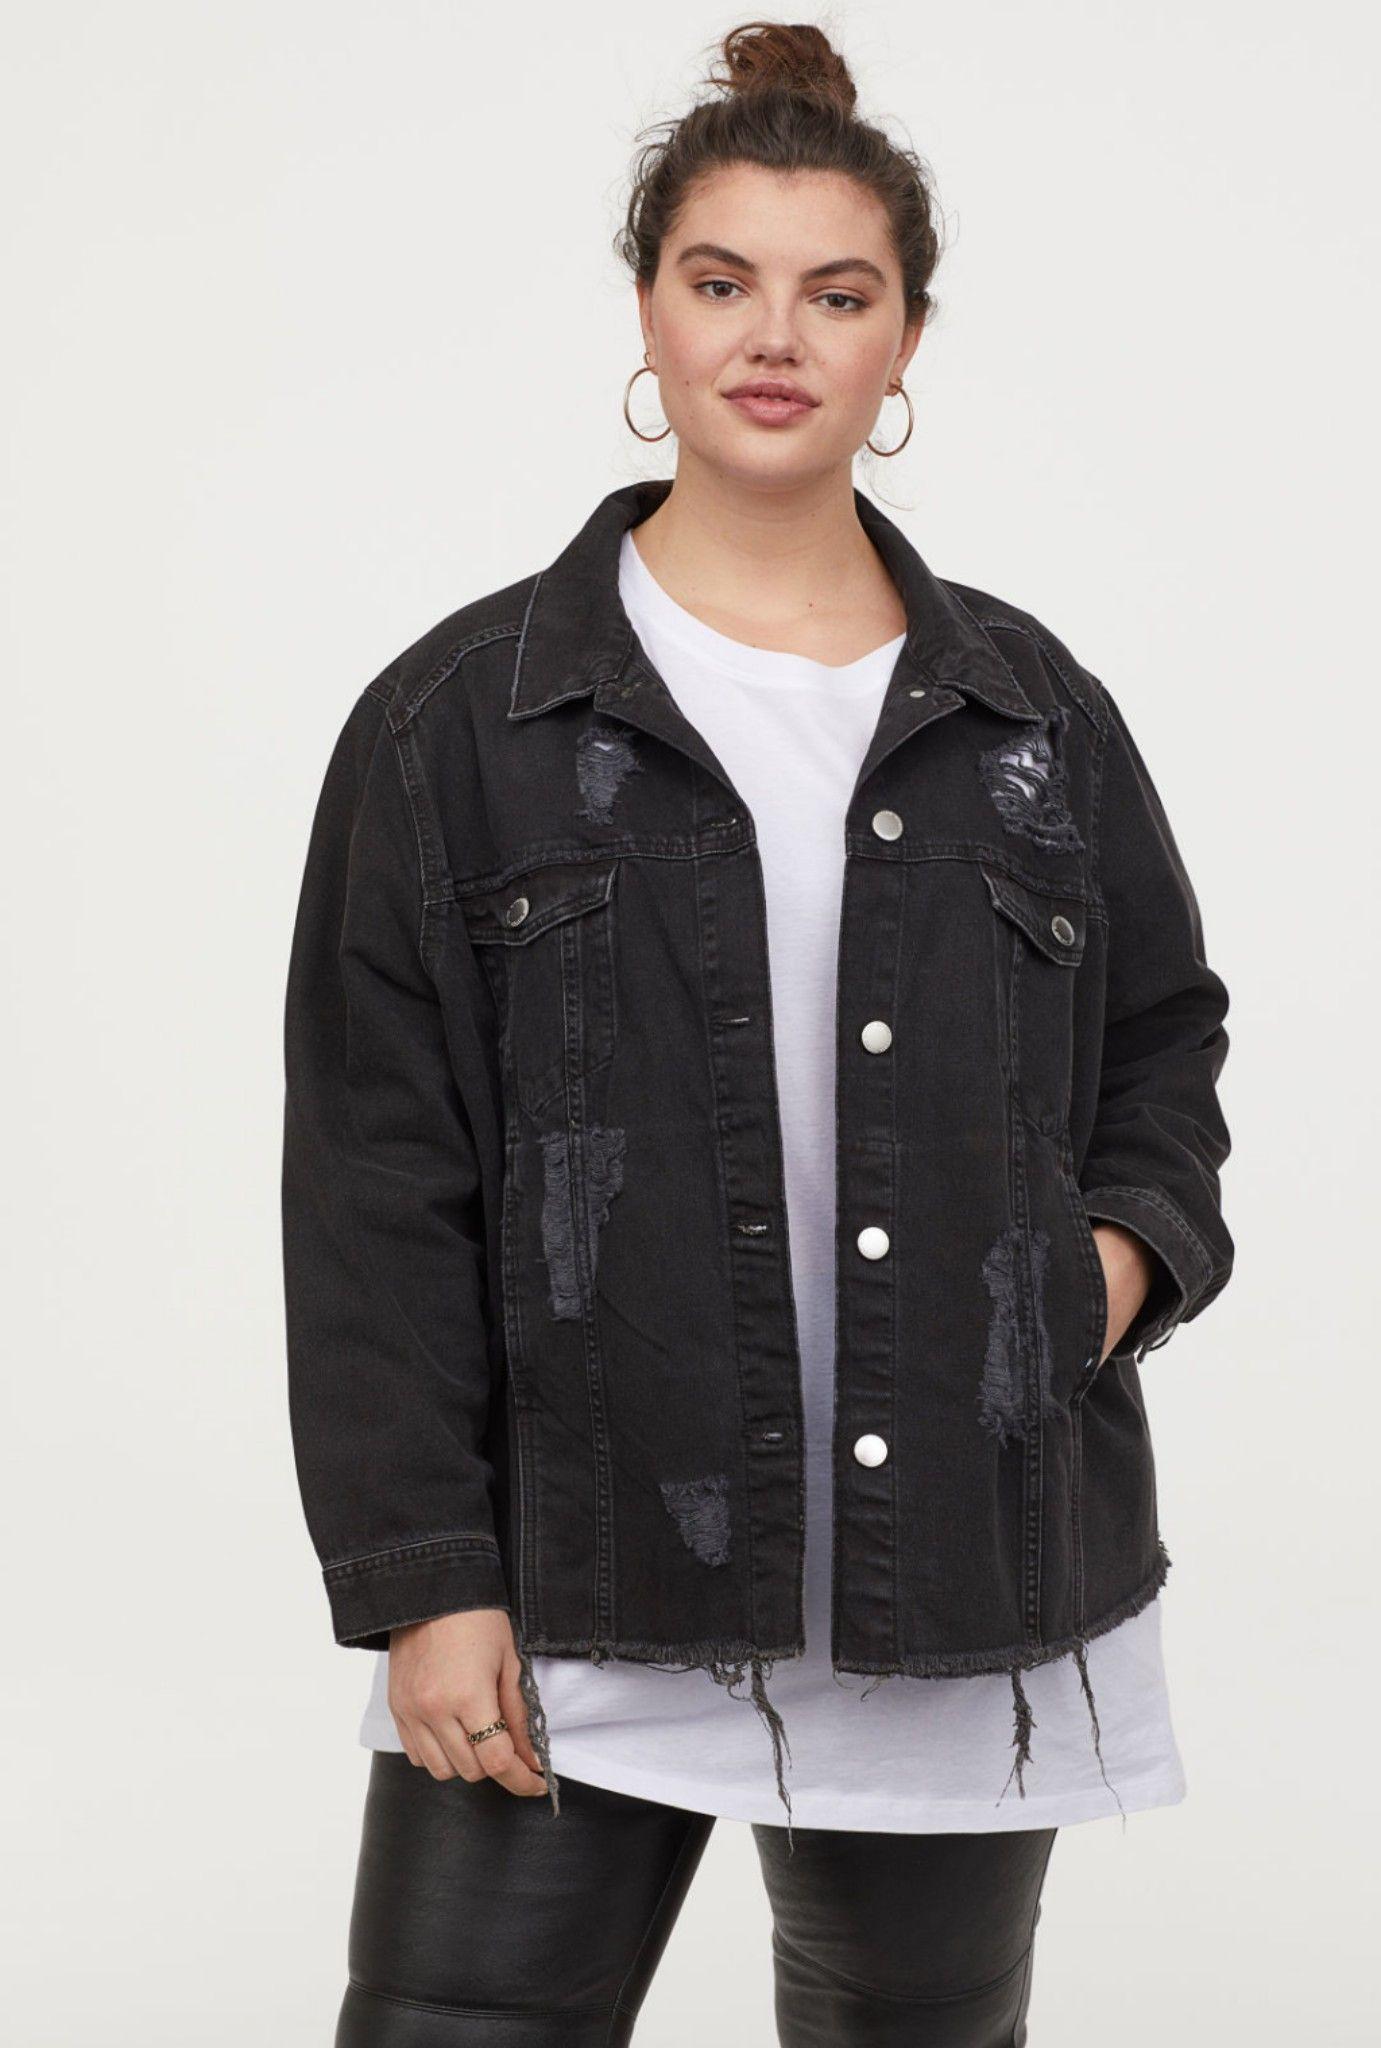 Jean Jacket White Tee Leather Pants H M Denim Jacket Jackets Black Denim Jacket [ 2048 x 1381 Pixel ]